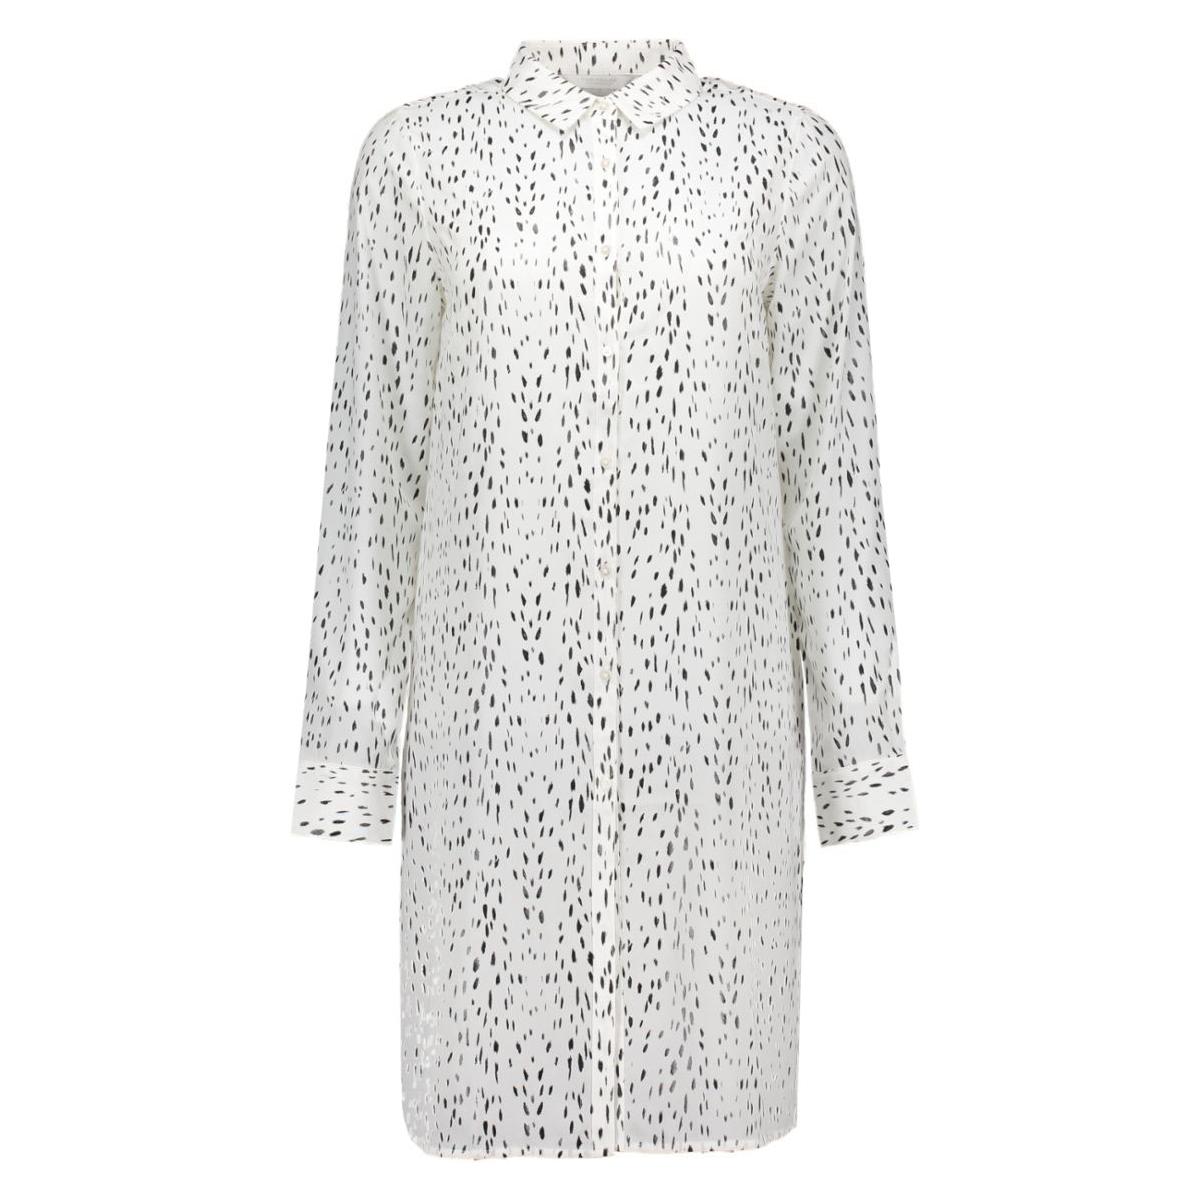 2032222.00.75 tom tailor blouse 8210